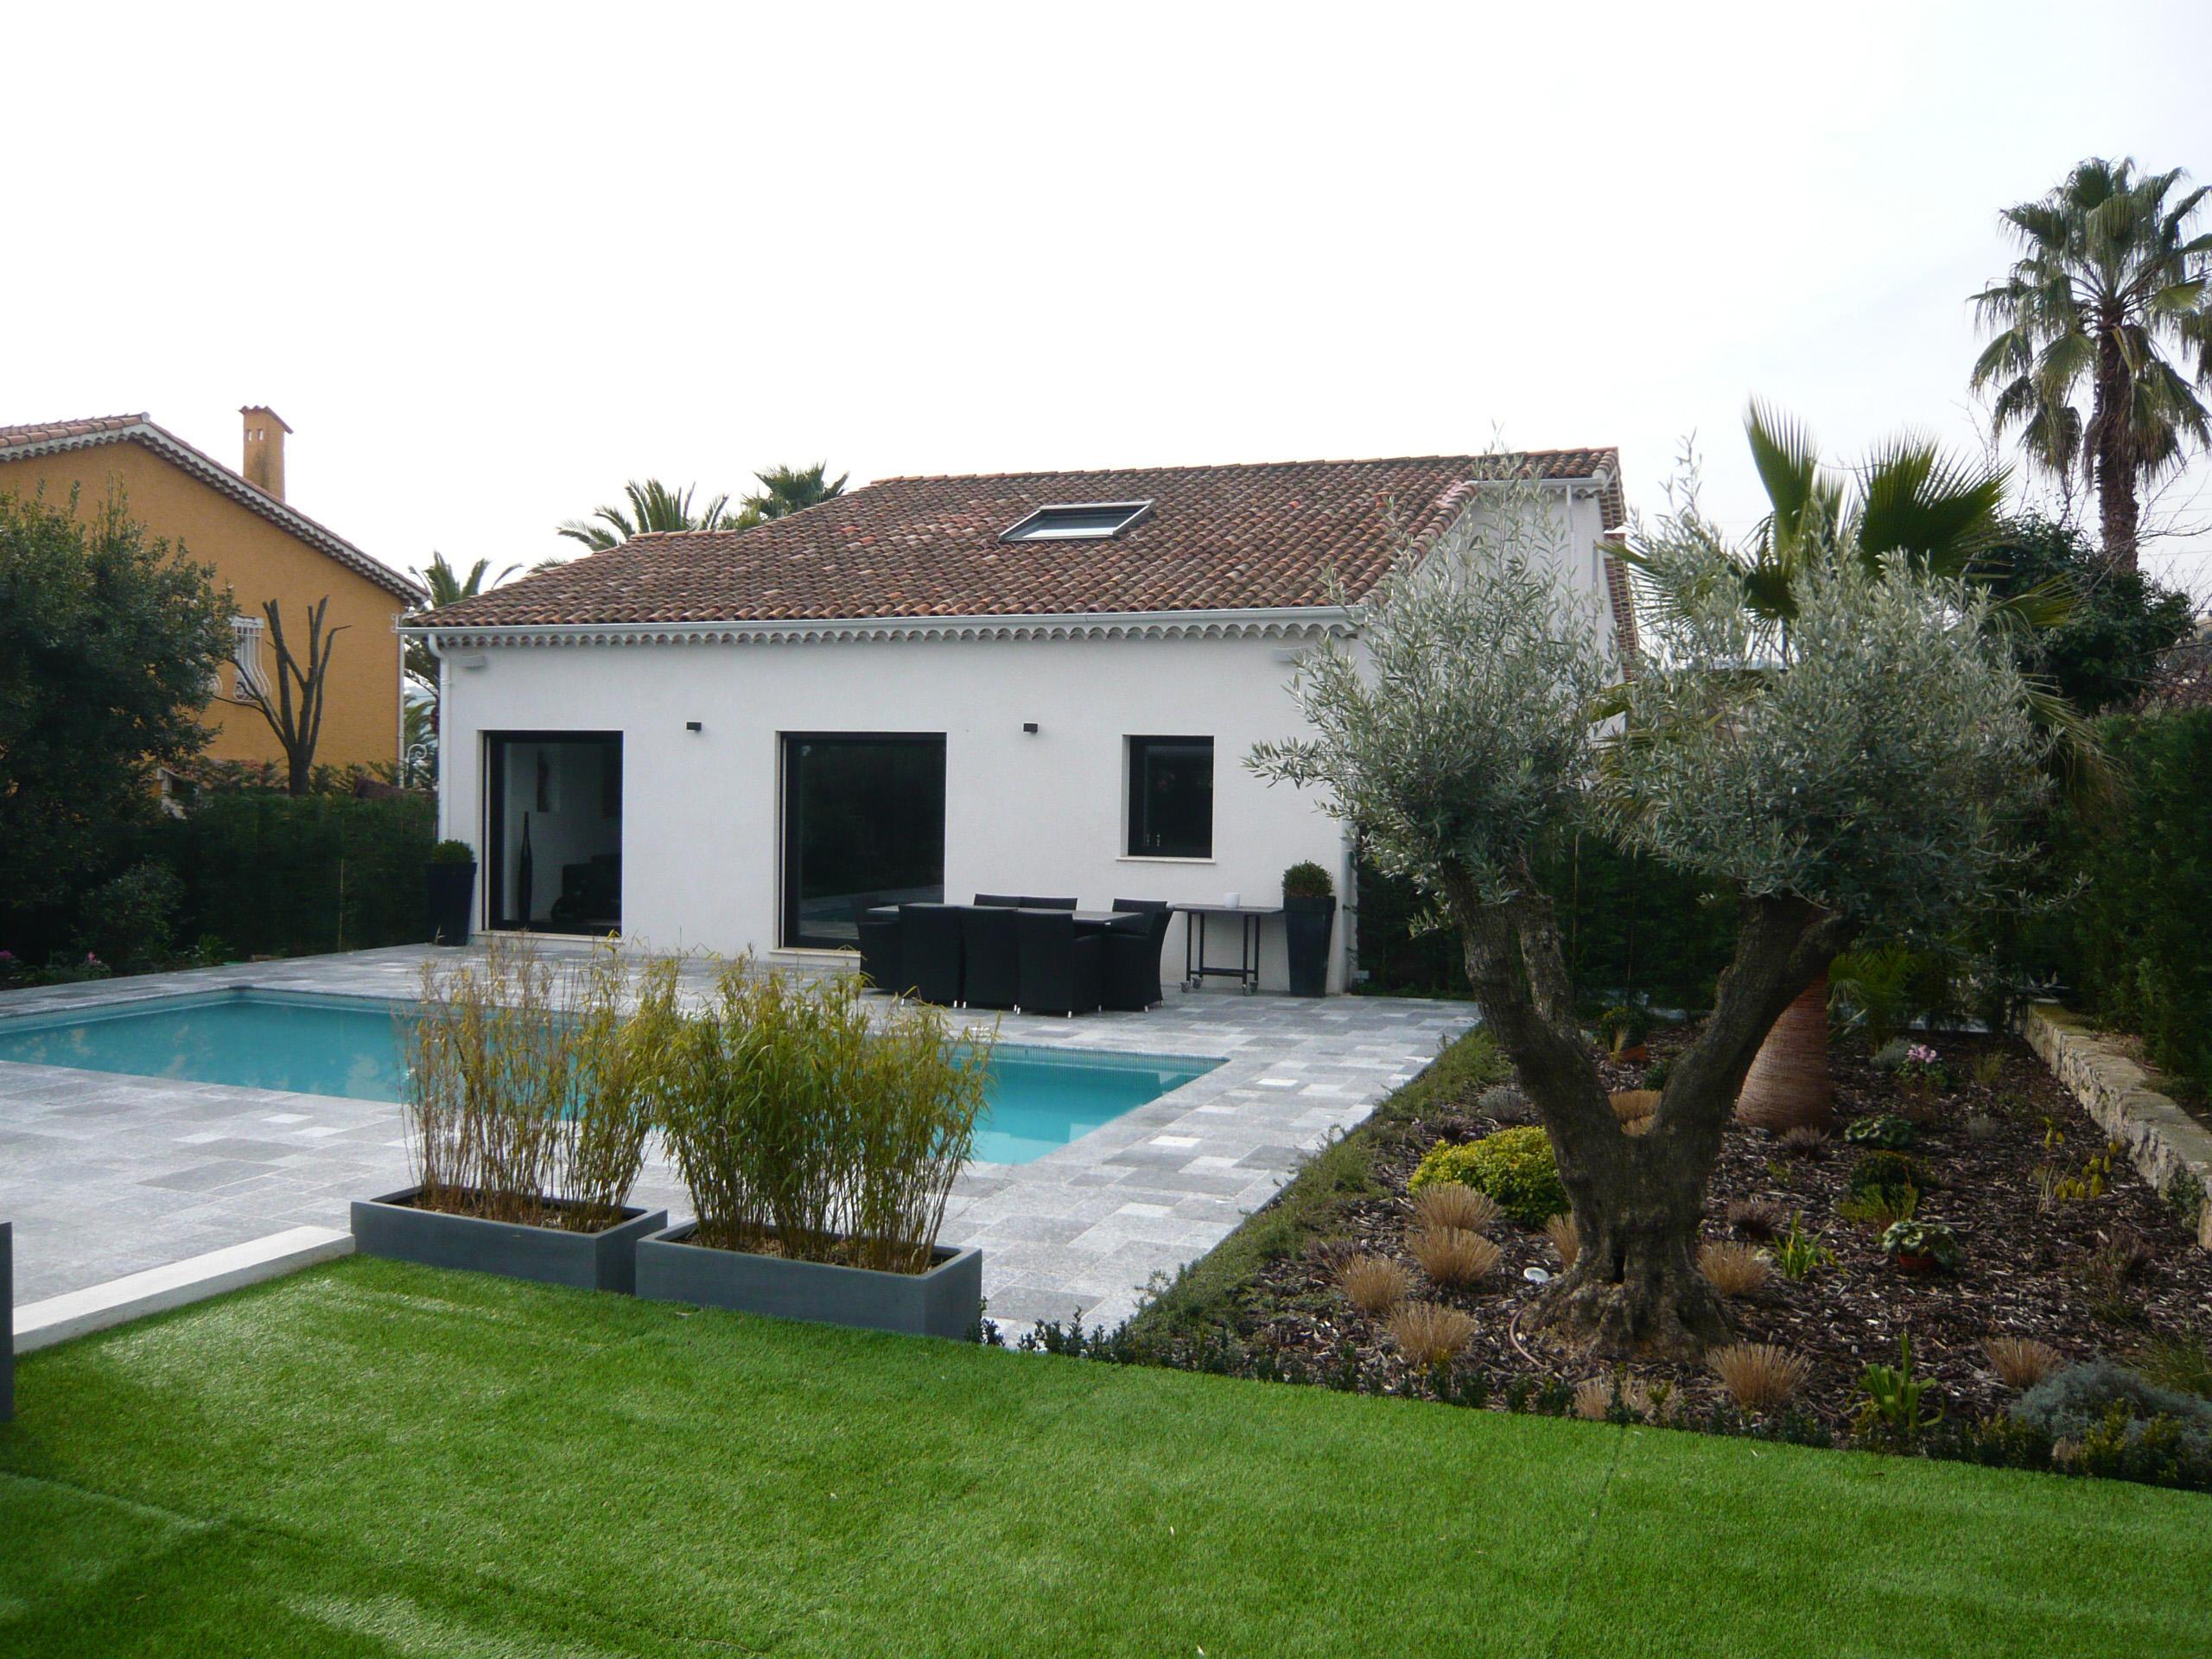 villa de prestige de plain pied la vente avec piscine grand garage minelle orpi mandelieu. Black Bedroom Furniture Sets. Home Design Ideas